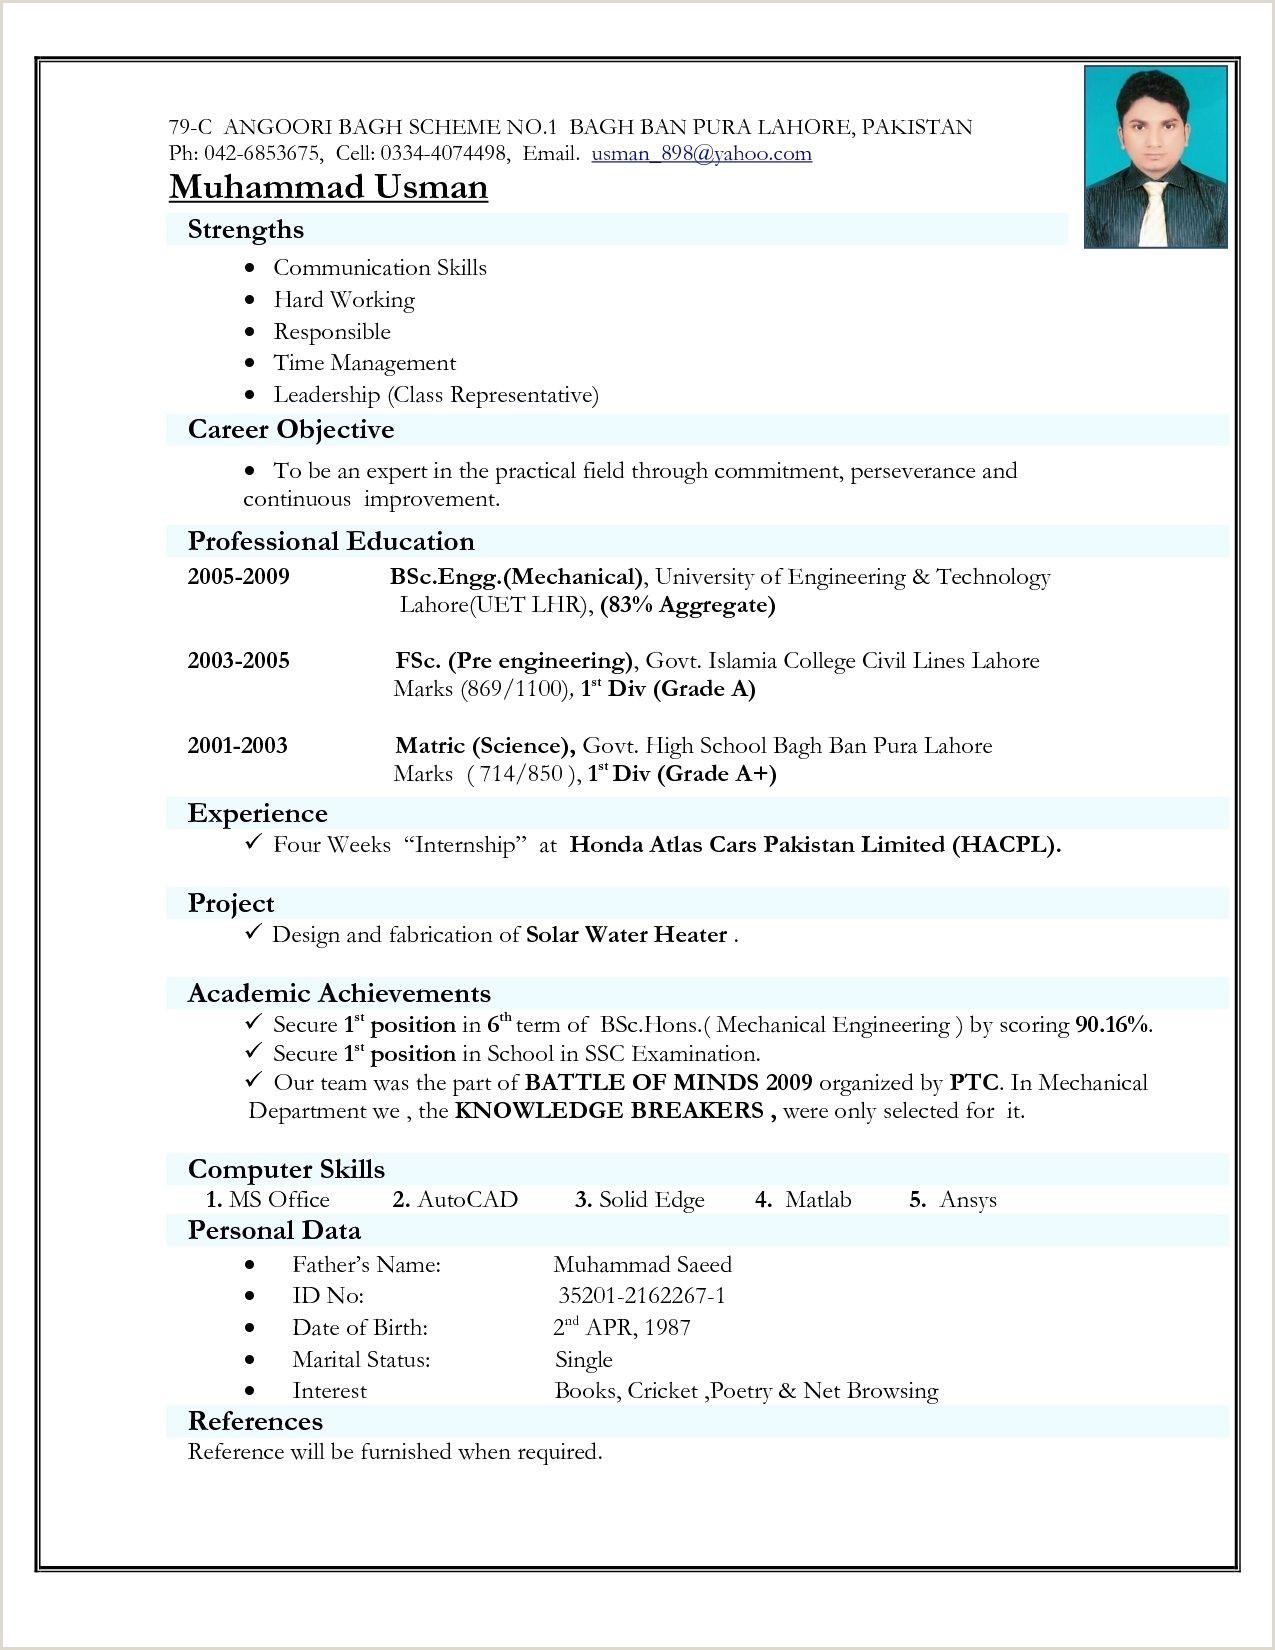 Fresher Resume Format India Resume Format India D